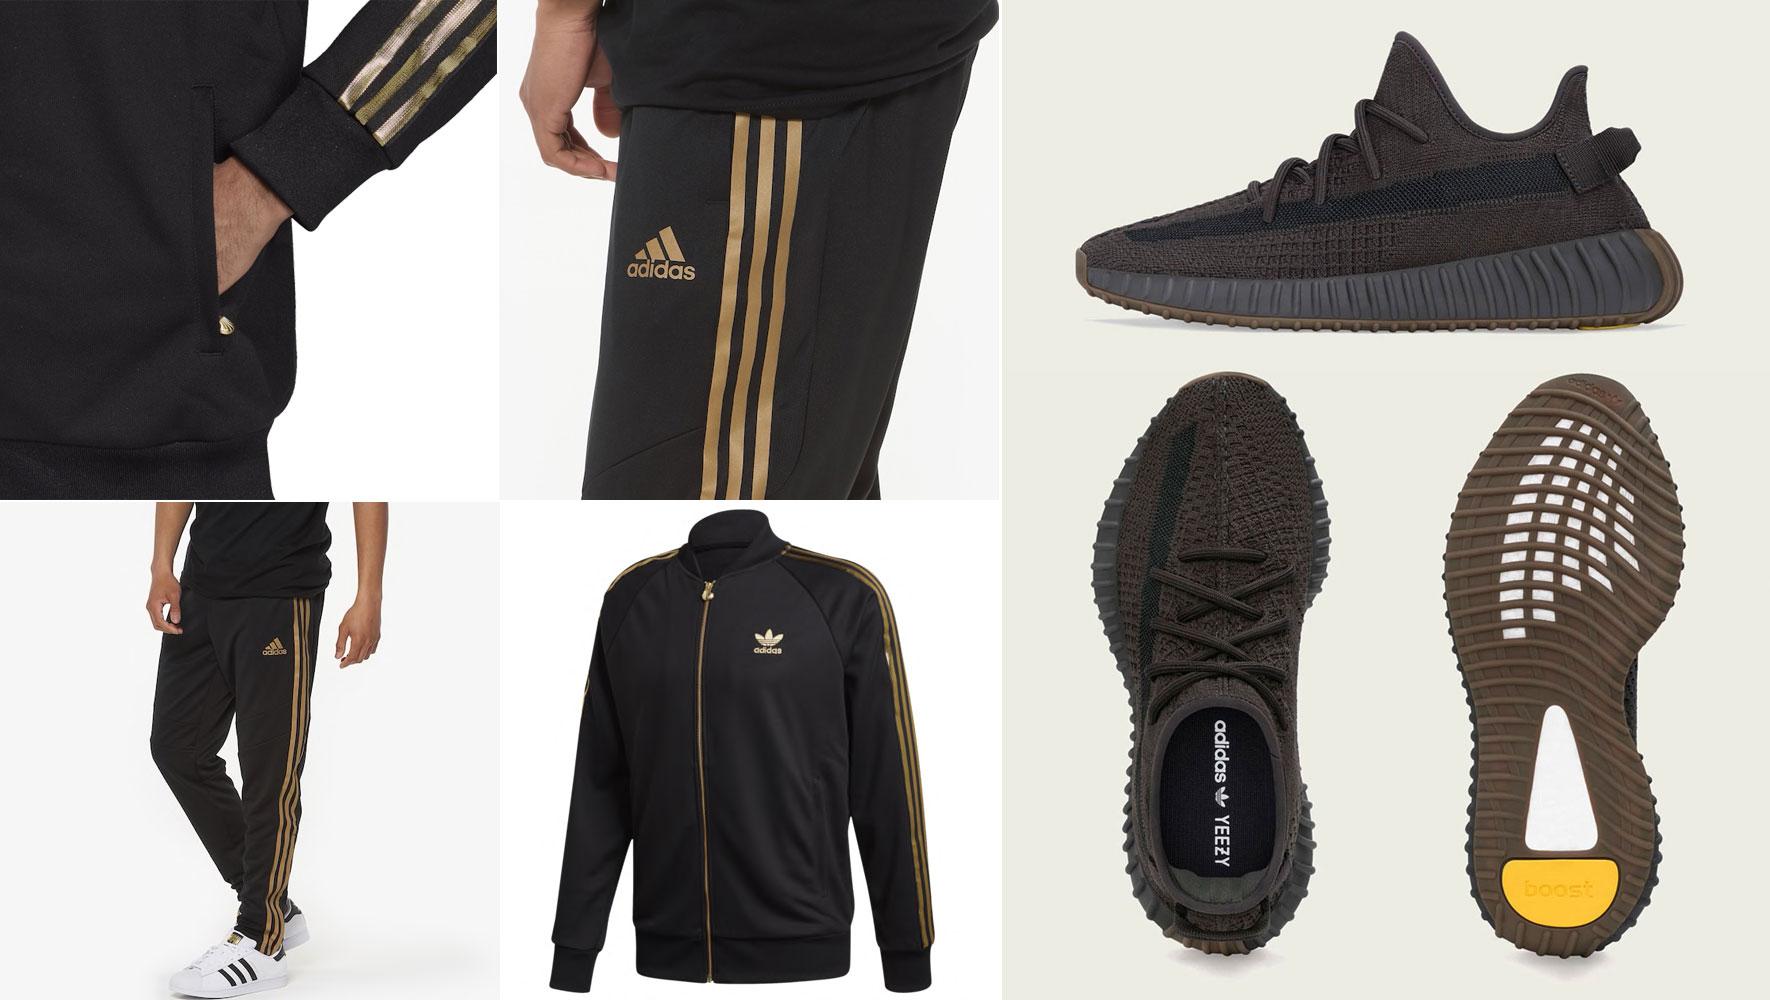 yeezy-boost-350-v2-cinder-adidas-clothing